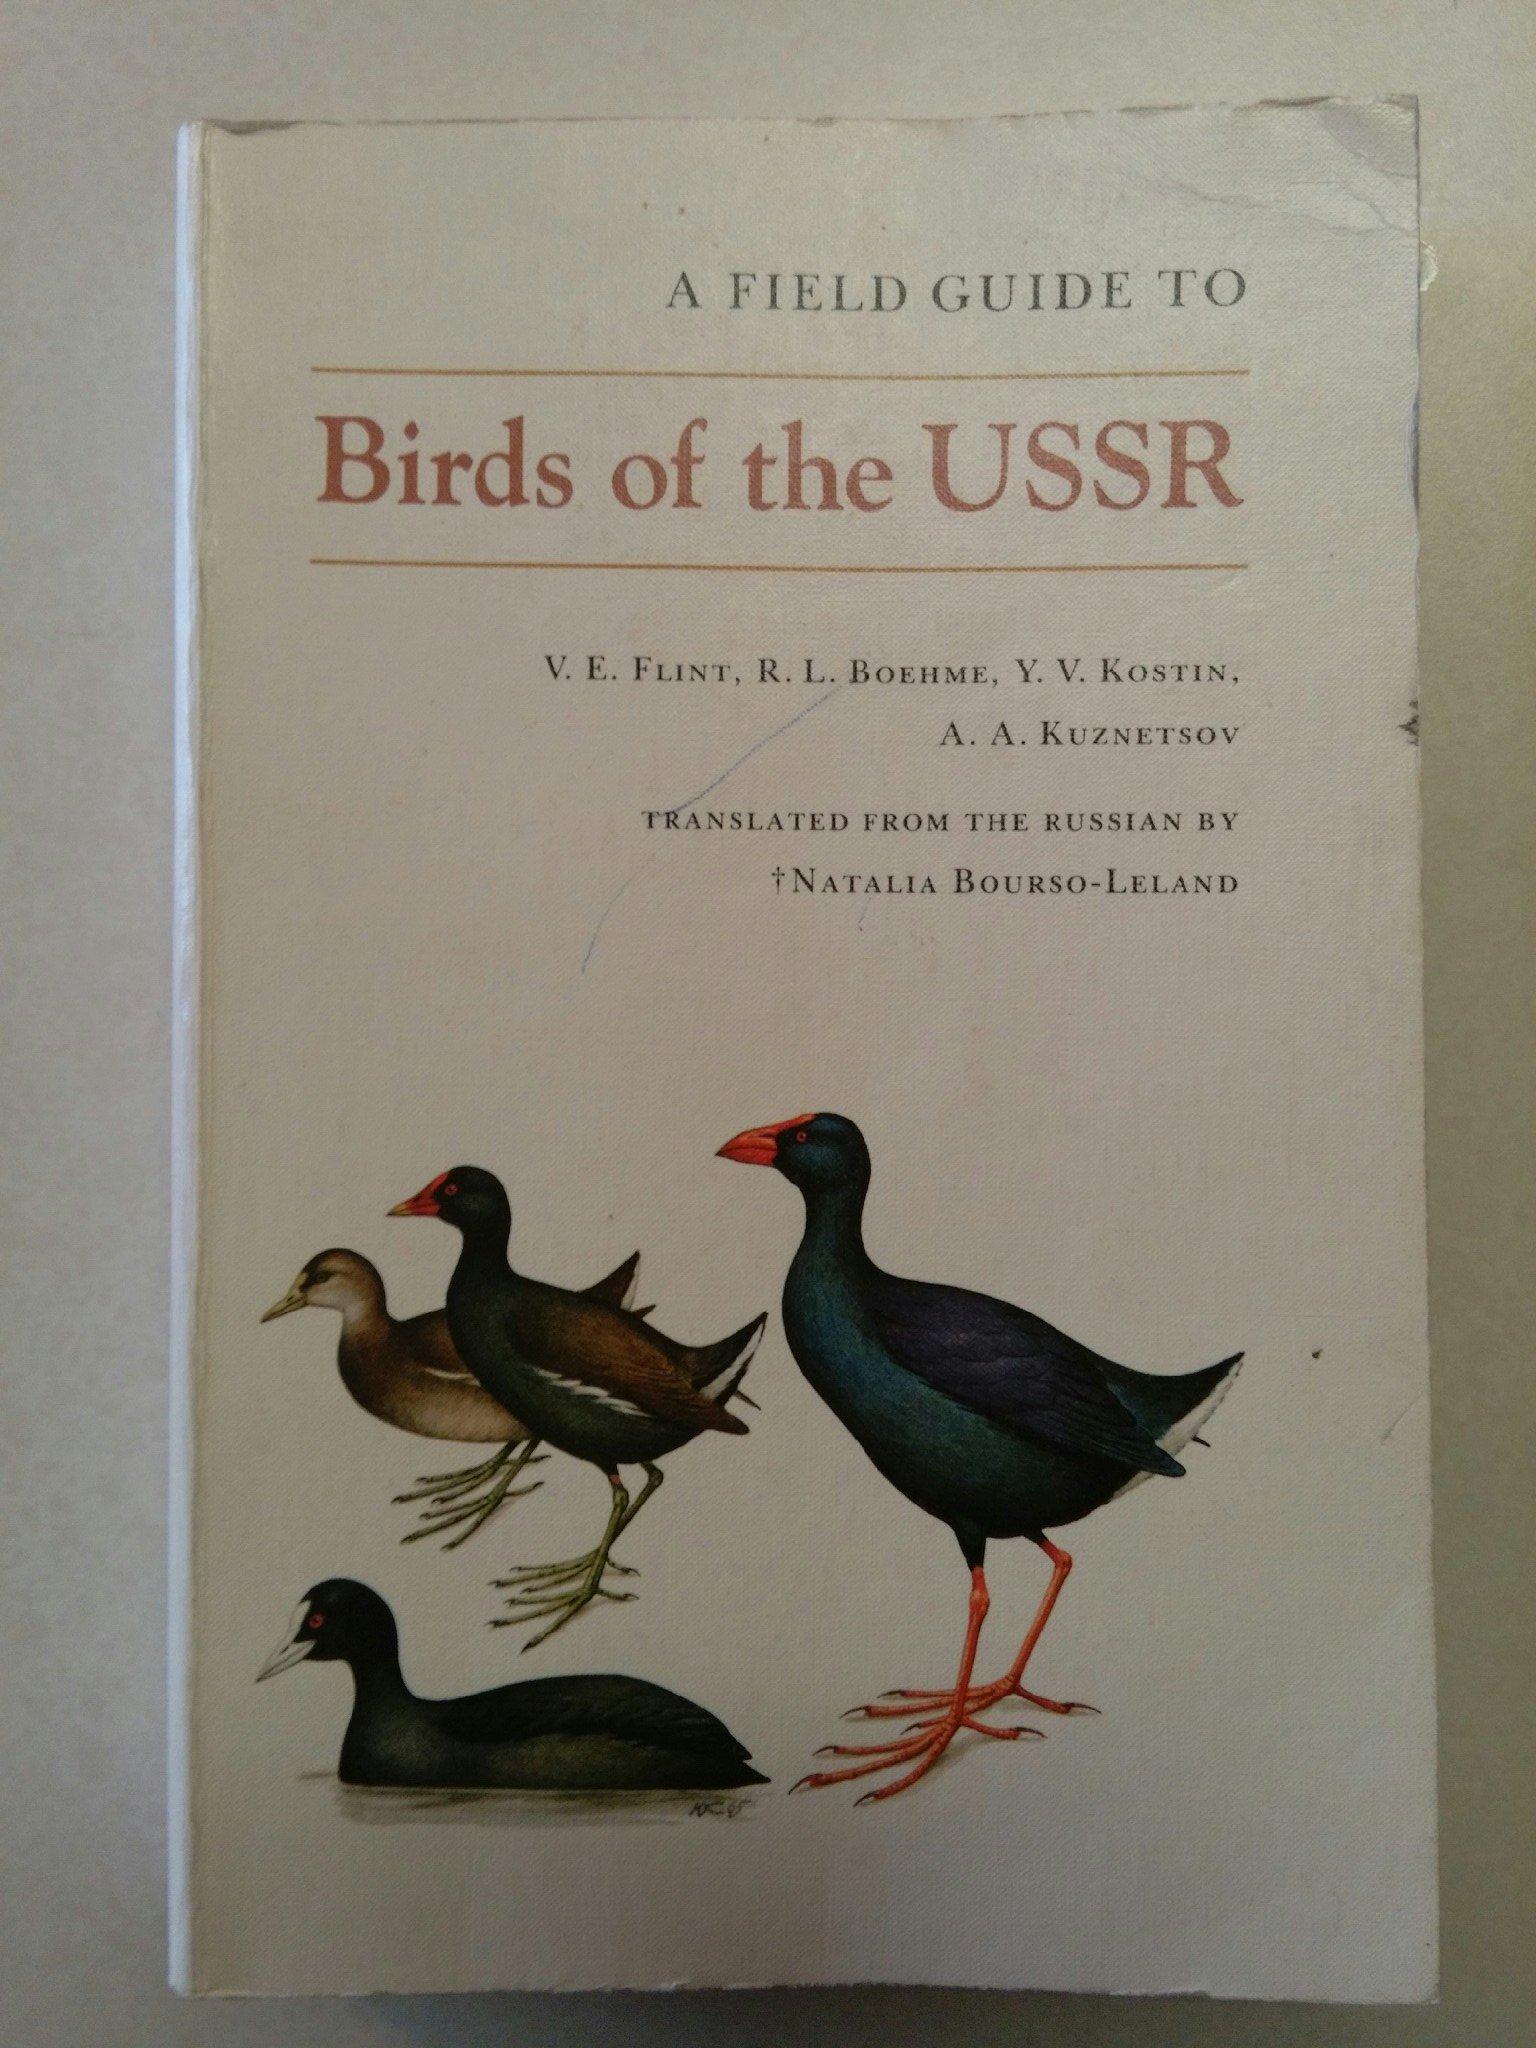 A Field Guide to Birds of Russia and Adjacent Territories: Vladimir  Evgenevich Flint, L. Boehmer, Natalia Bourso-Leland: 9780691082448:  Amazon.com: Books